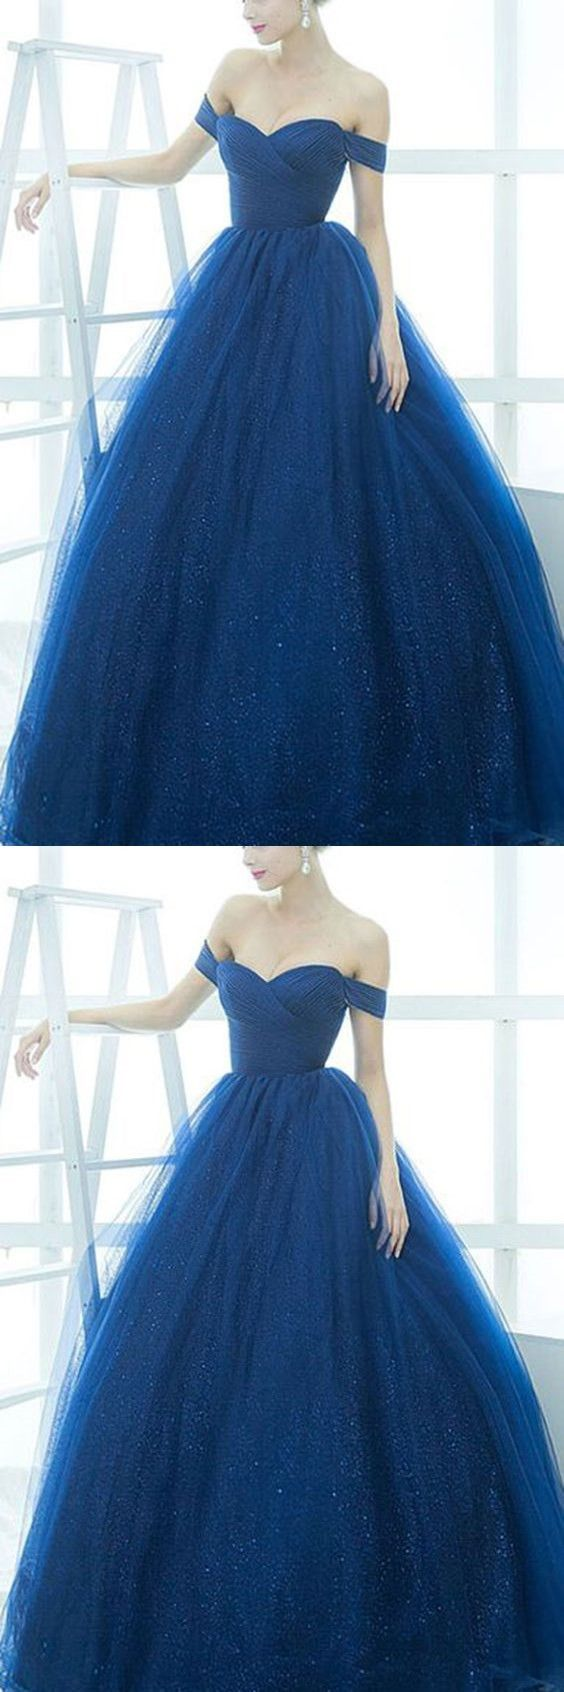 Royal blue organza offshoulder simple ball gown dresseslong dress